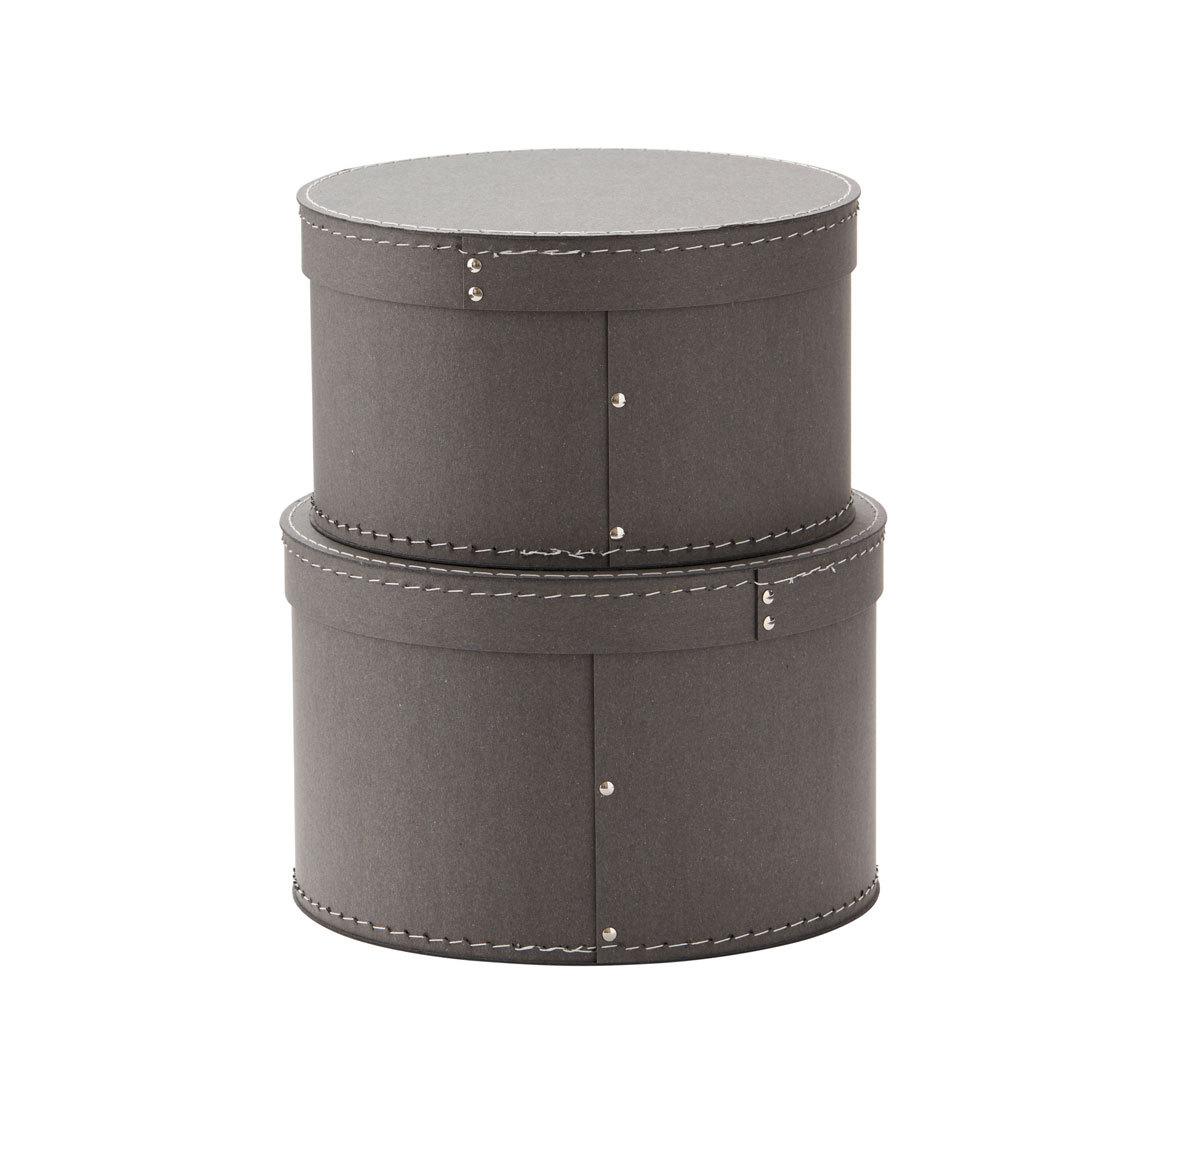 Panier & corbeille Lot de 2 Boîtes de Rangement Rondes - Gris Lot de 2 Boîtes de Rangement Rondes - Gris